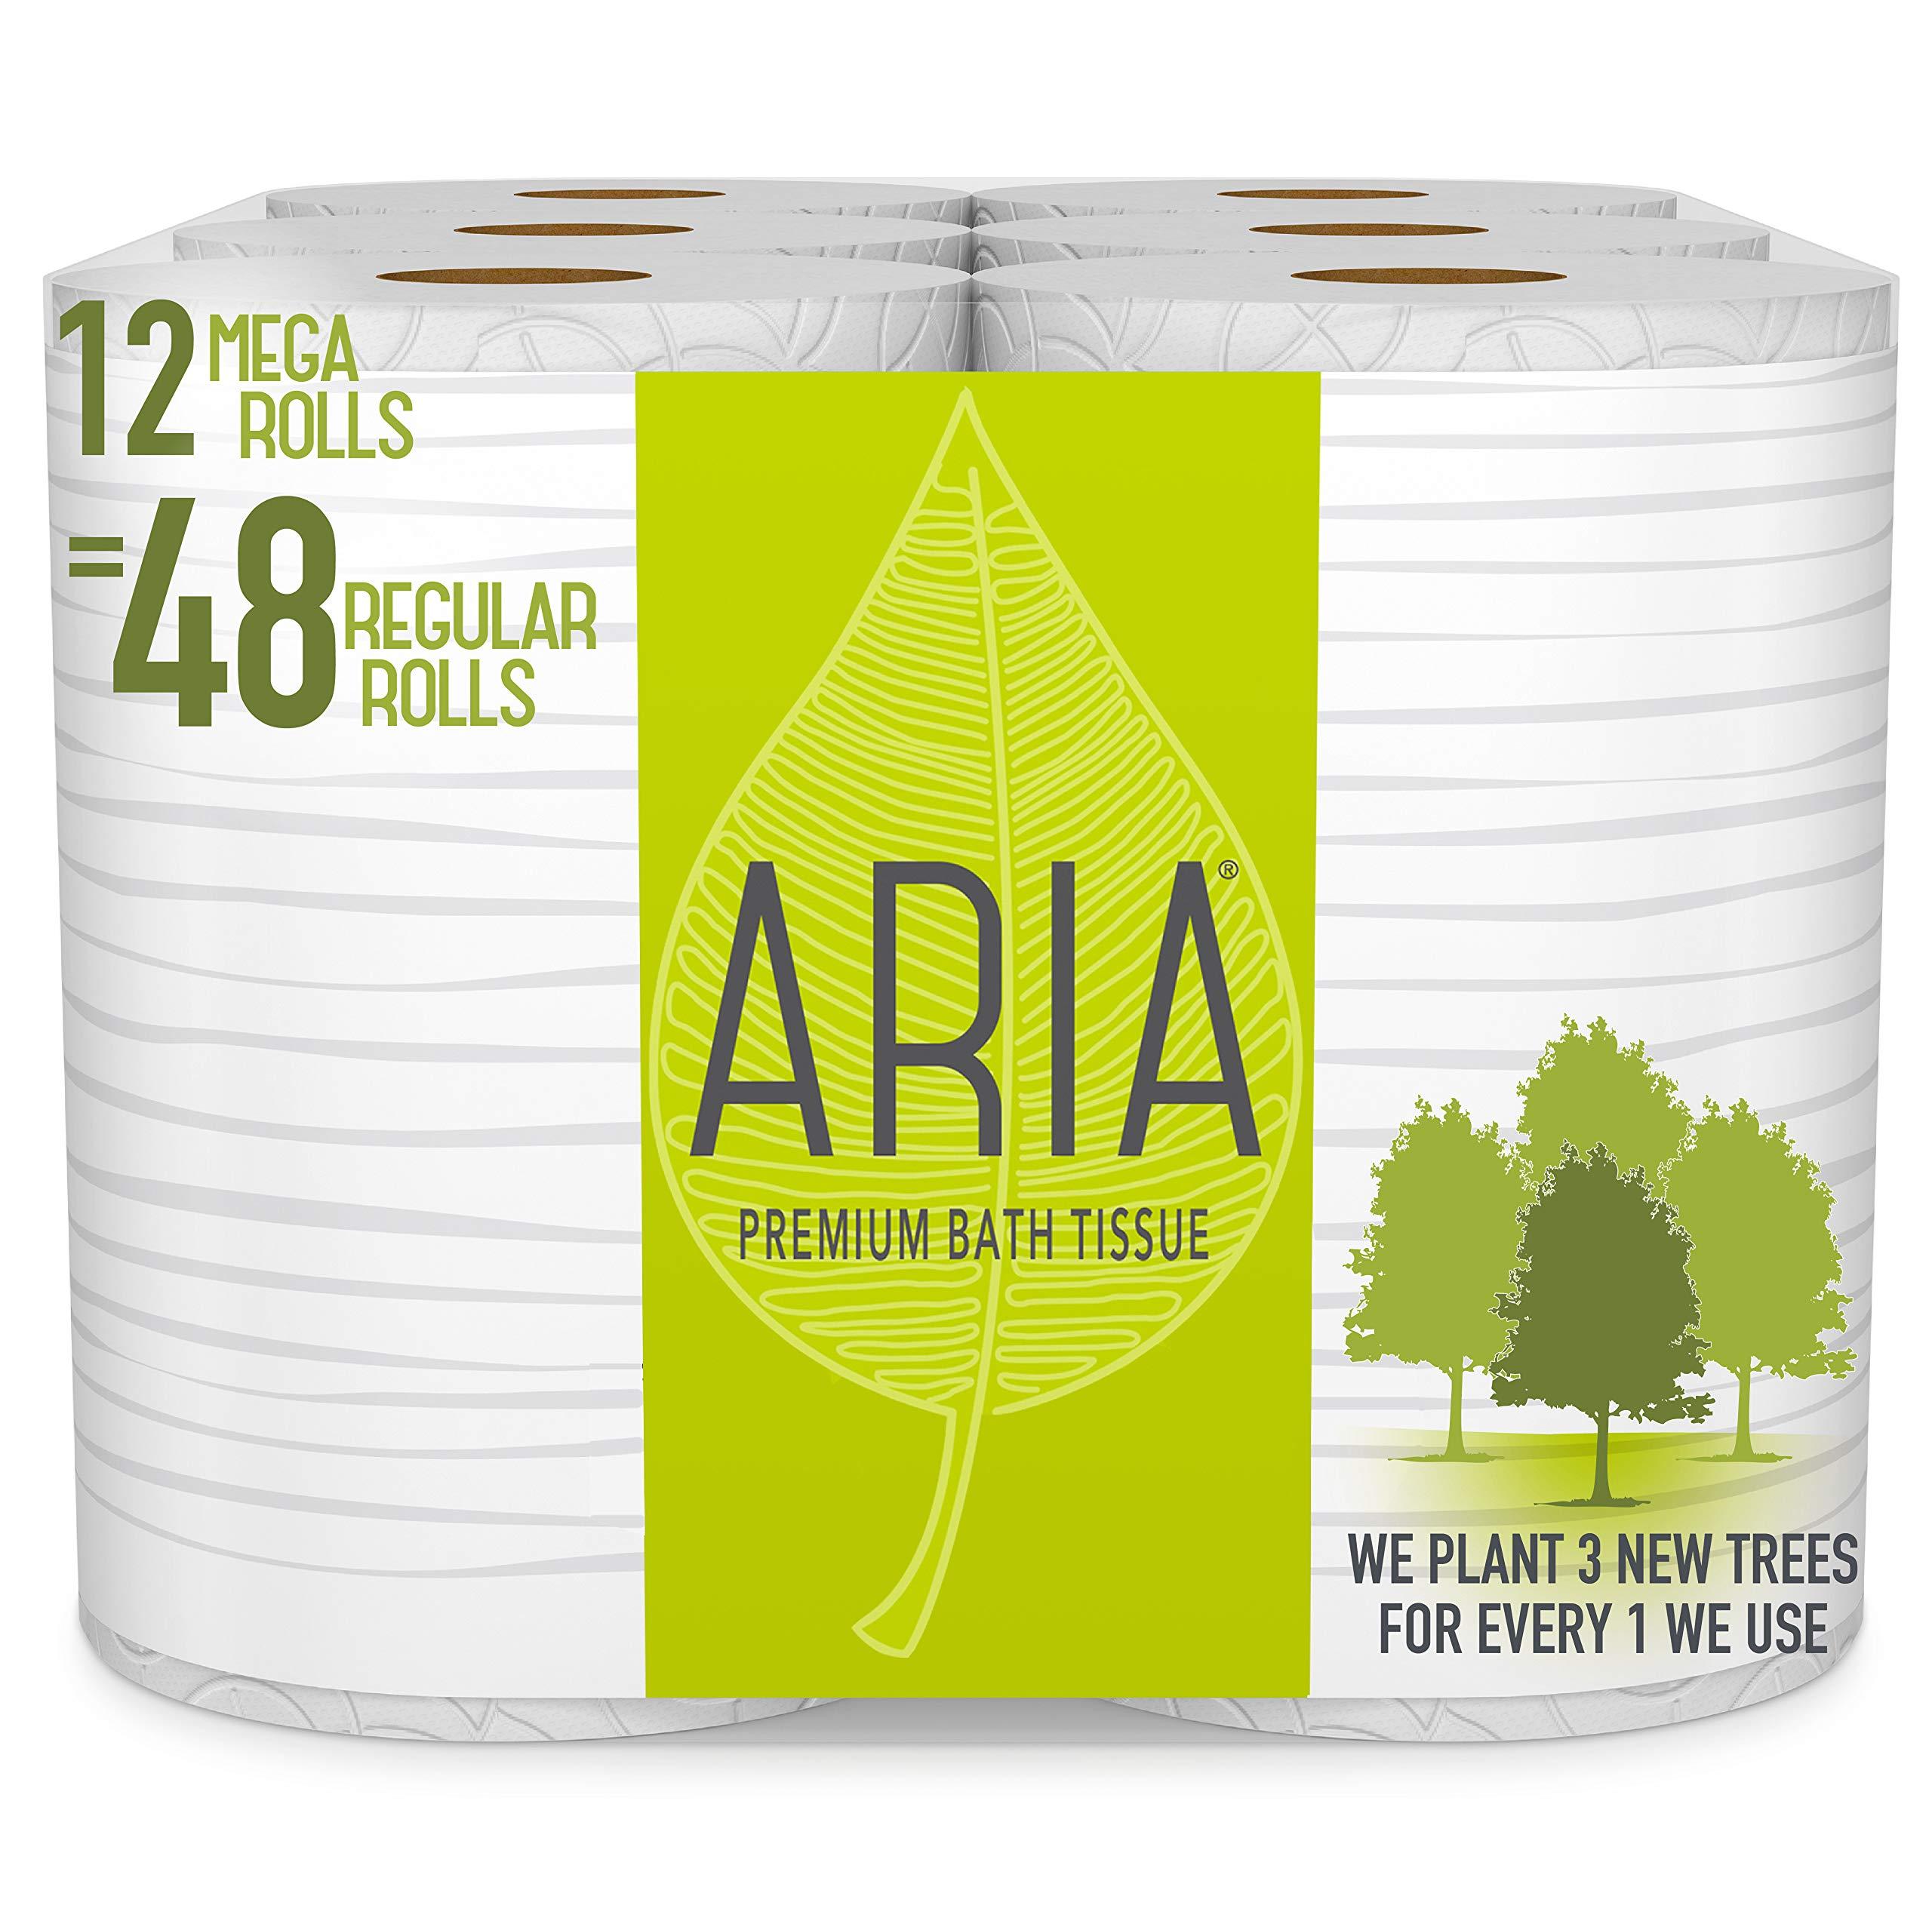 Aria Premium, Earth Friendly Toilet Paper, 12 Mega Rolls, 12 = 48 Regular Rolls, Eco Friendly Bath Tissue by Aria